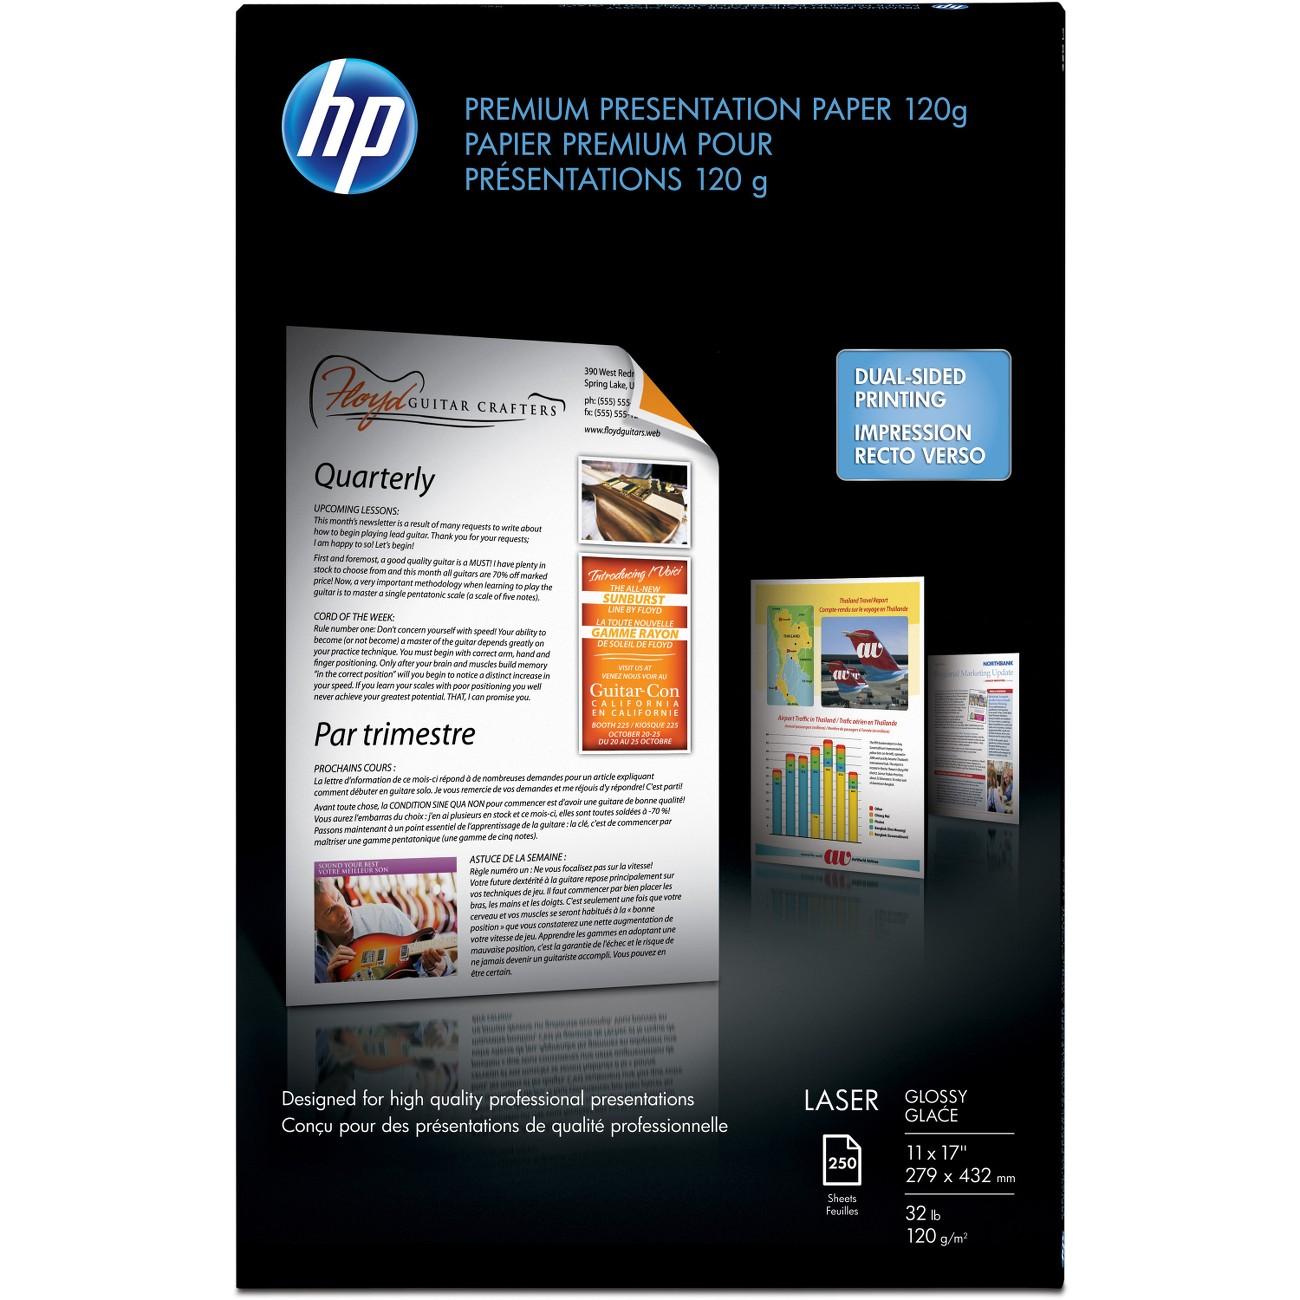 HP PAPER,LSR,GLSSY,11X17,250